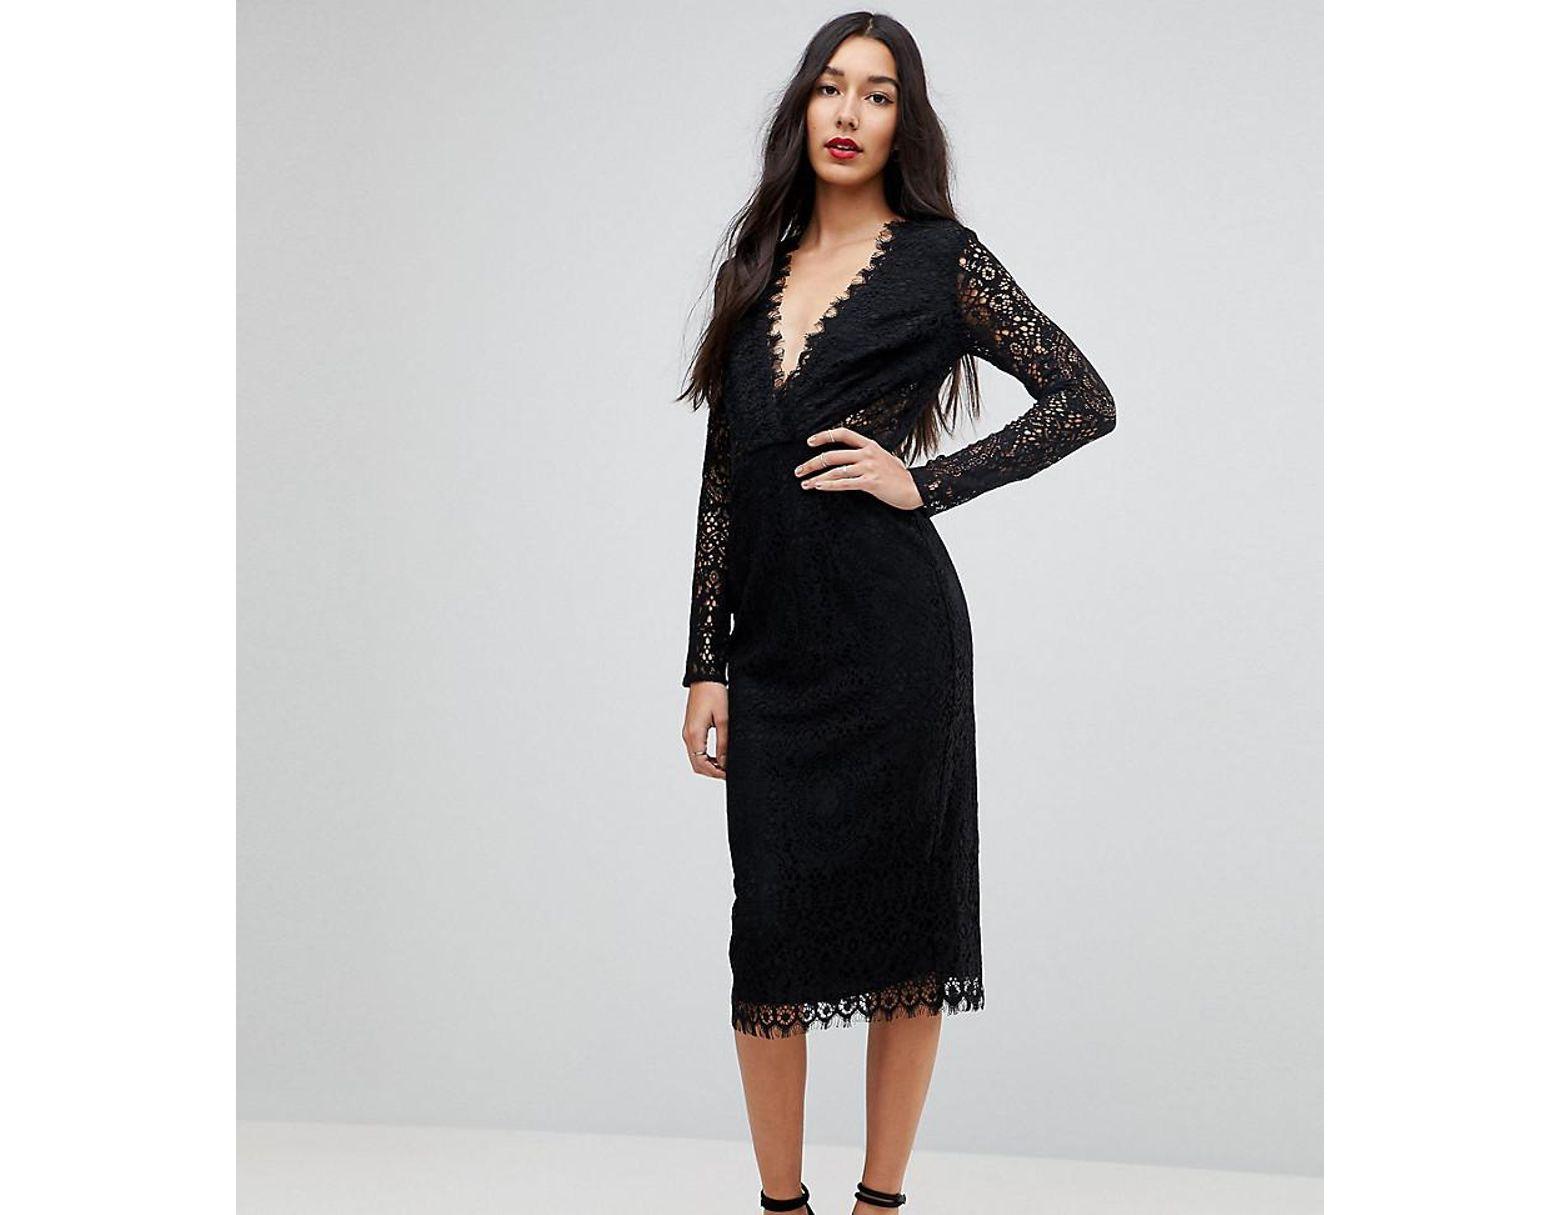 2a977d0a3c878 ASOS Long Sleeve Lace Midi Pencil Dress in Black - Lyst